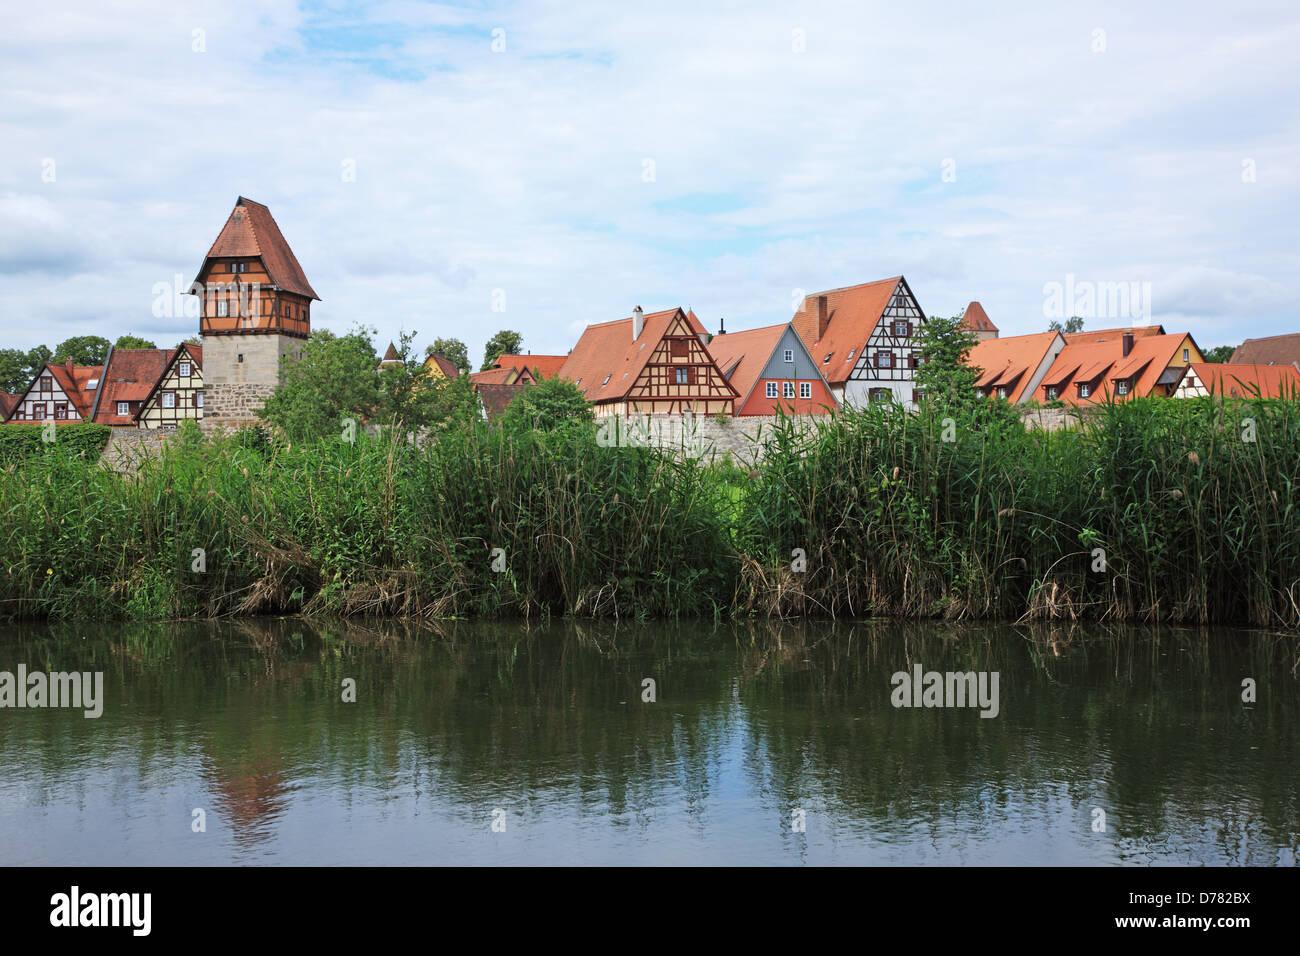 Germany, Bavaria, Romantic Road, Dinkelsbühl - Stock Image